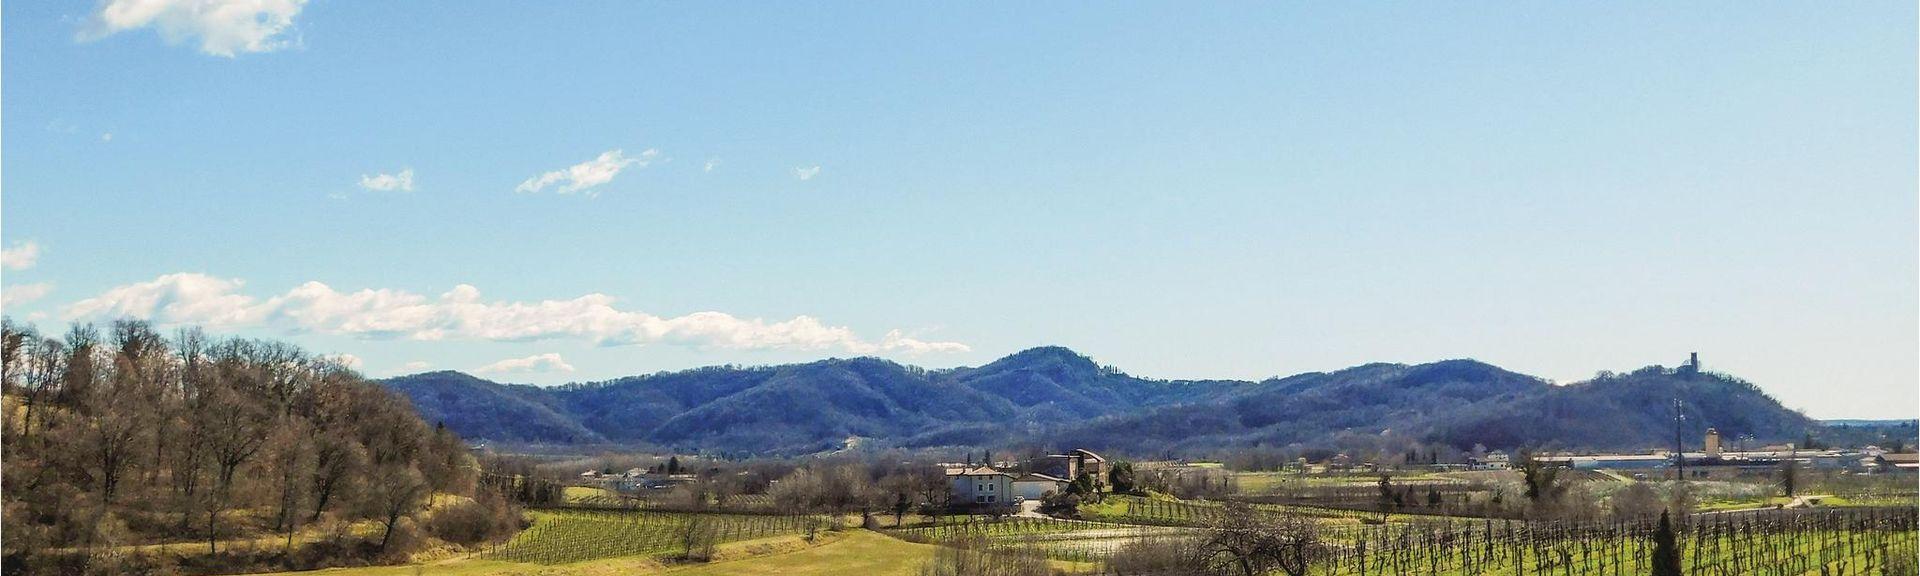 Codognè, Treviso, Italy